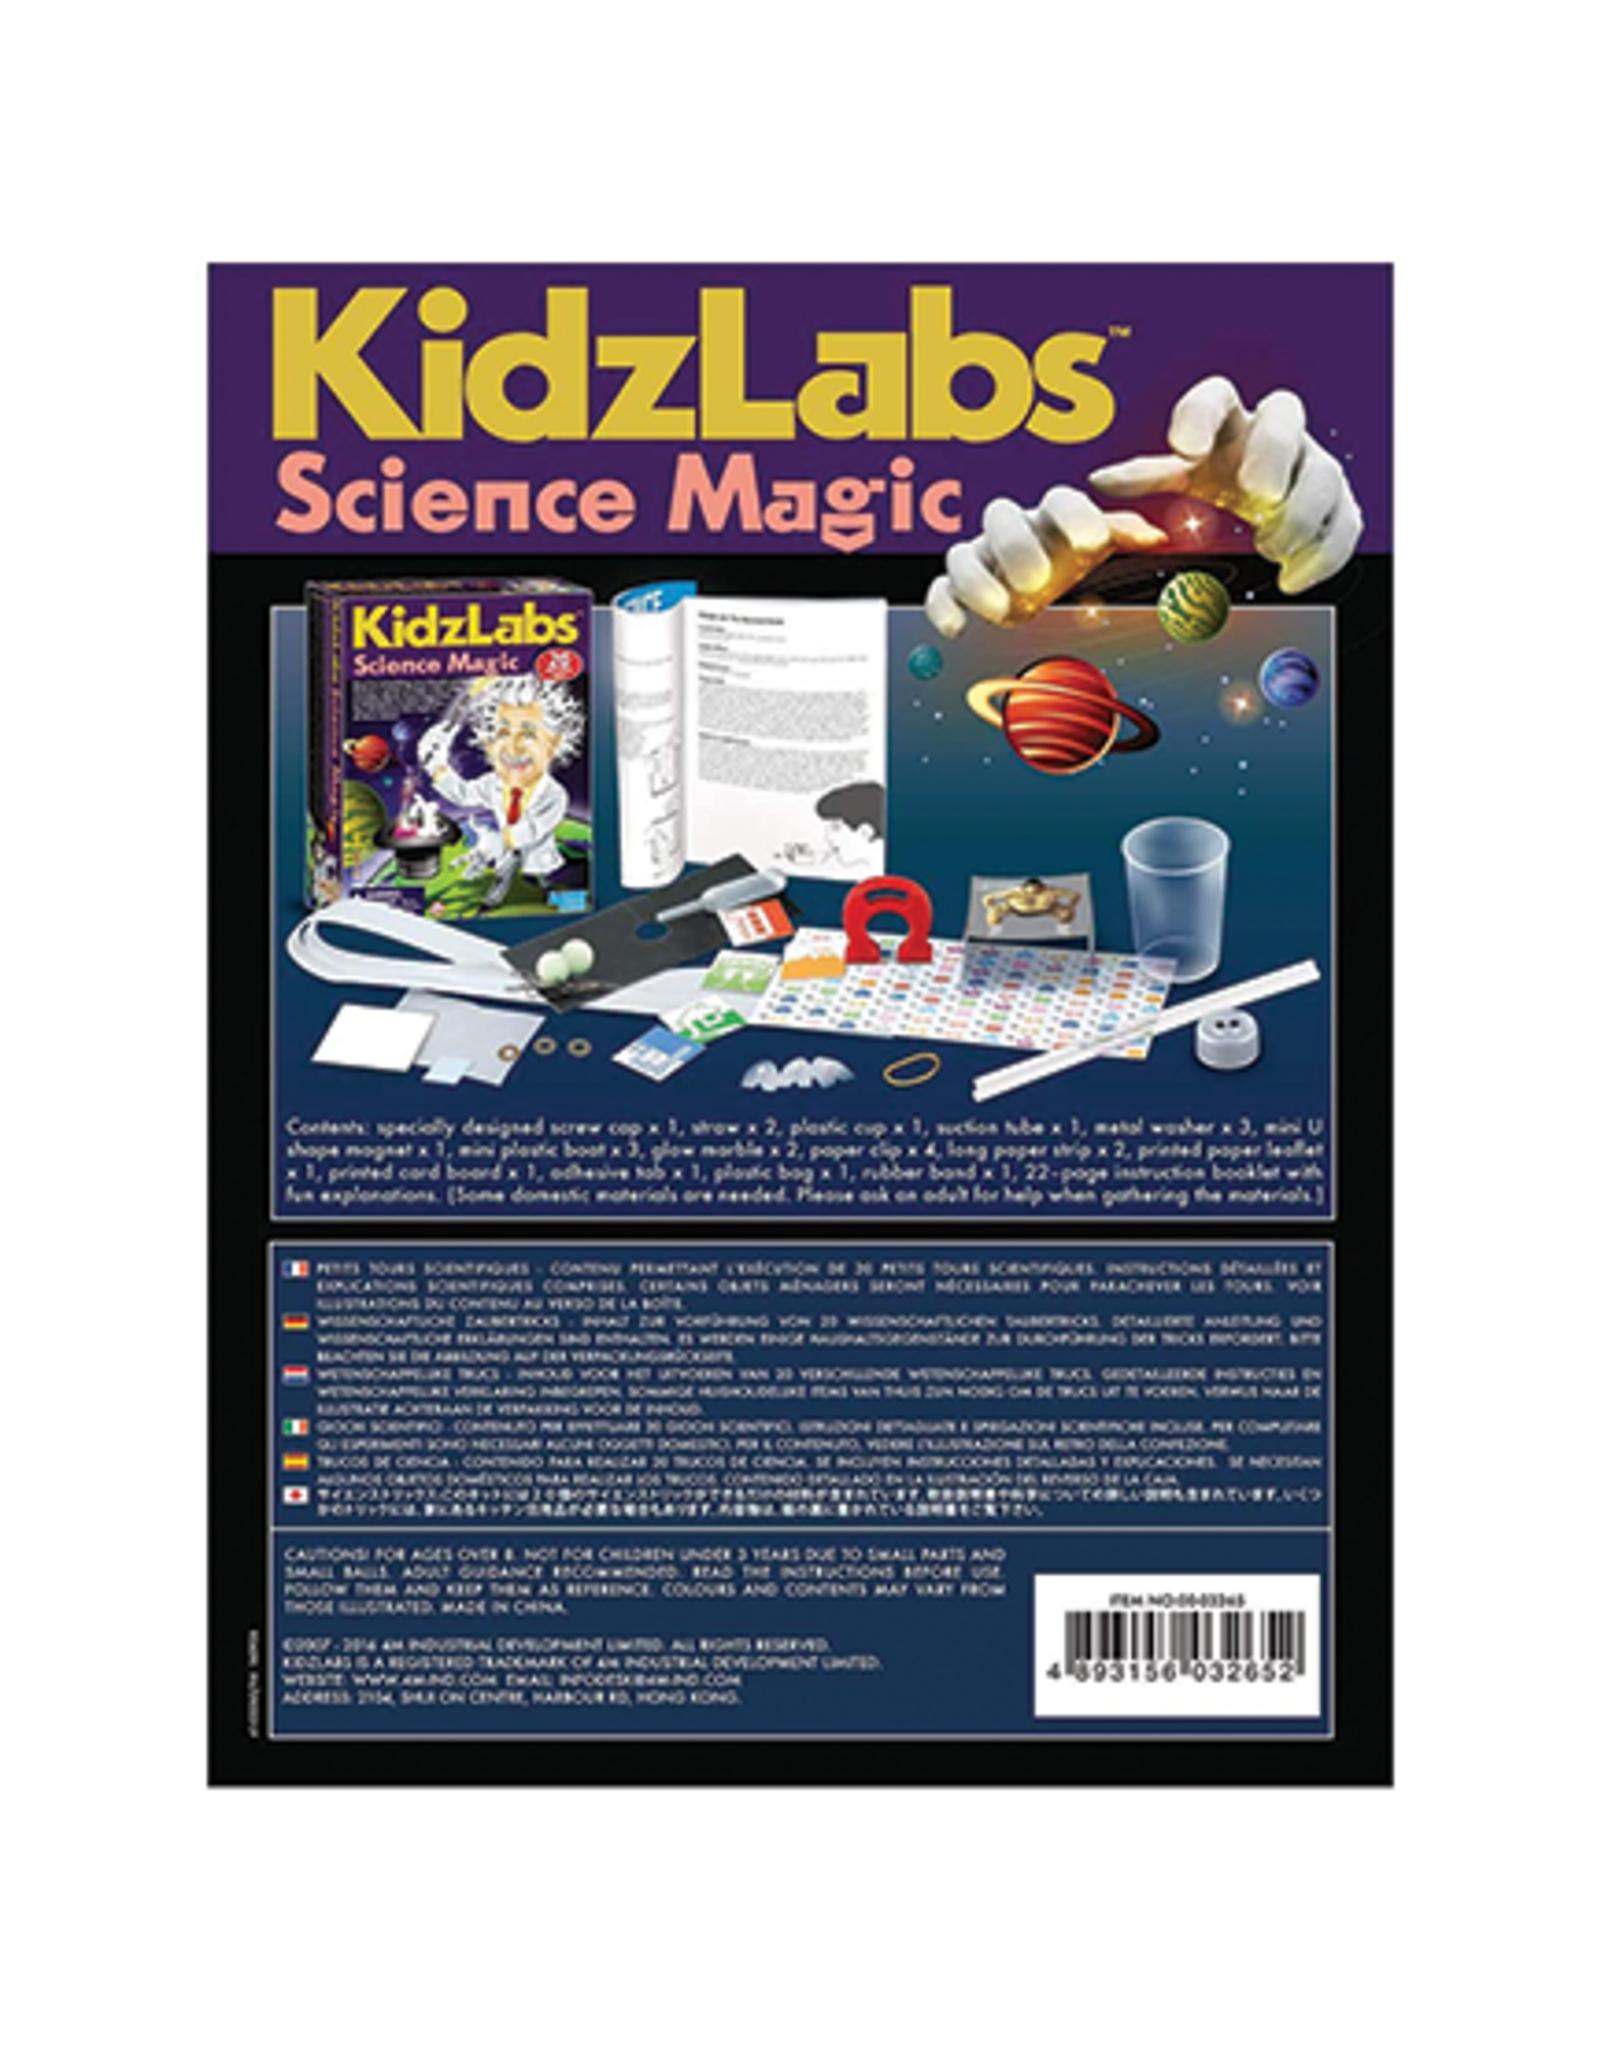 Toysmith Science Magic Kit by KidzLabs